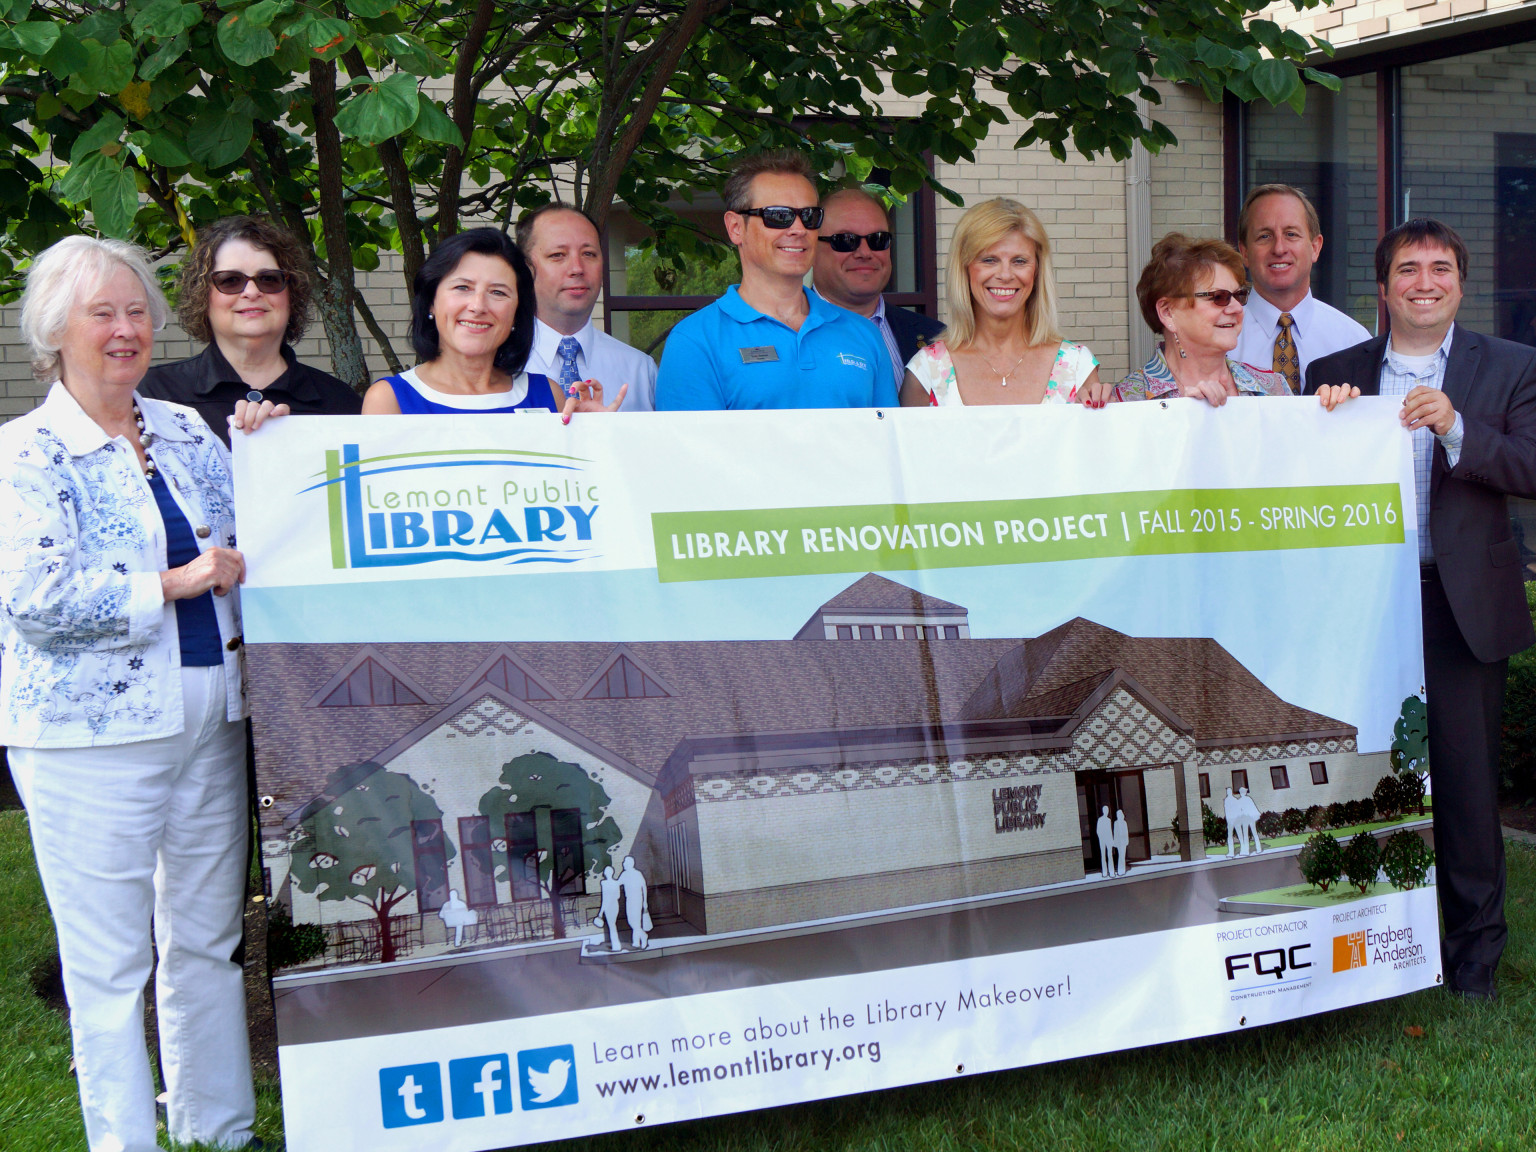 Groundbreaking: Lemont Public Library